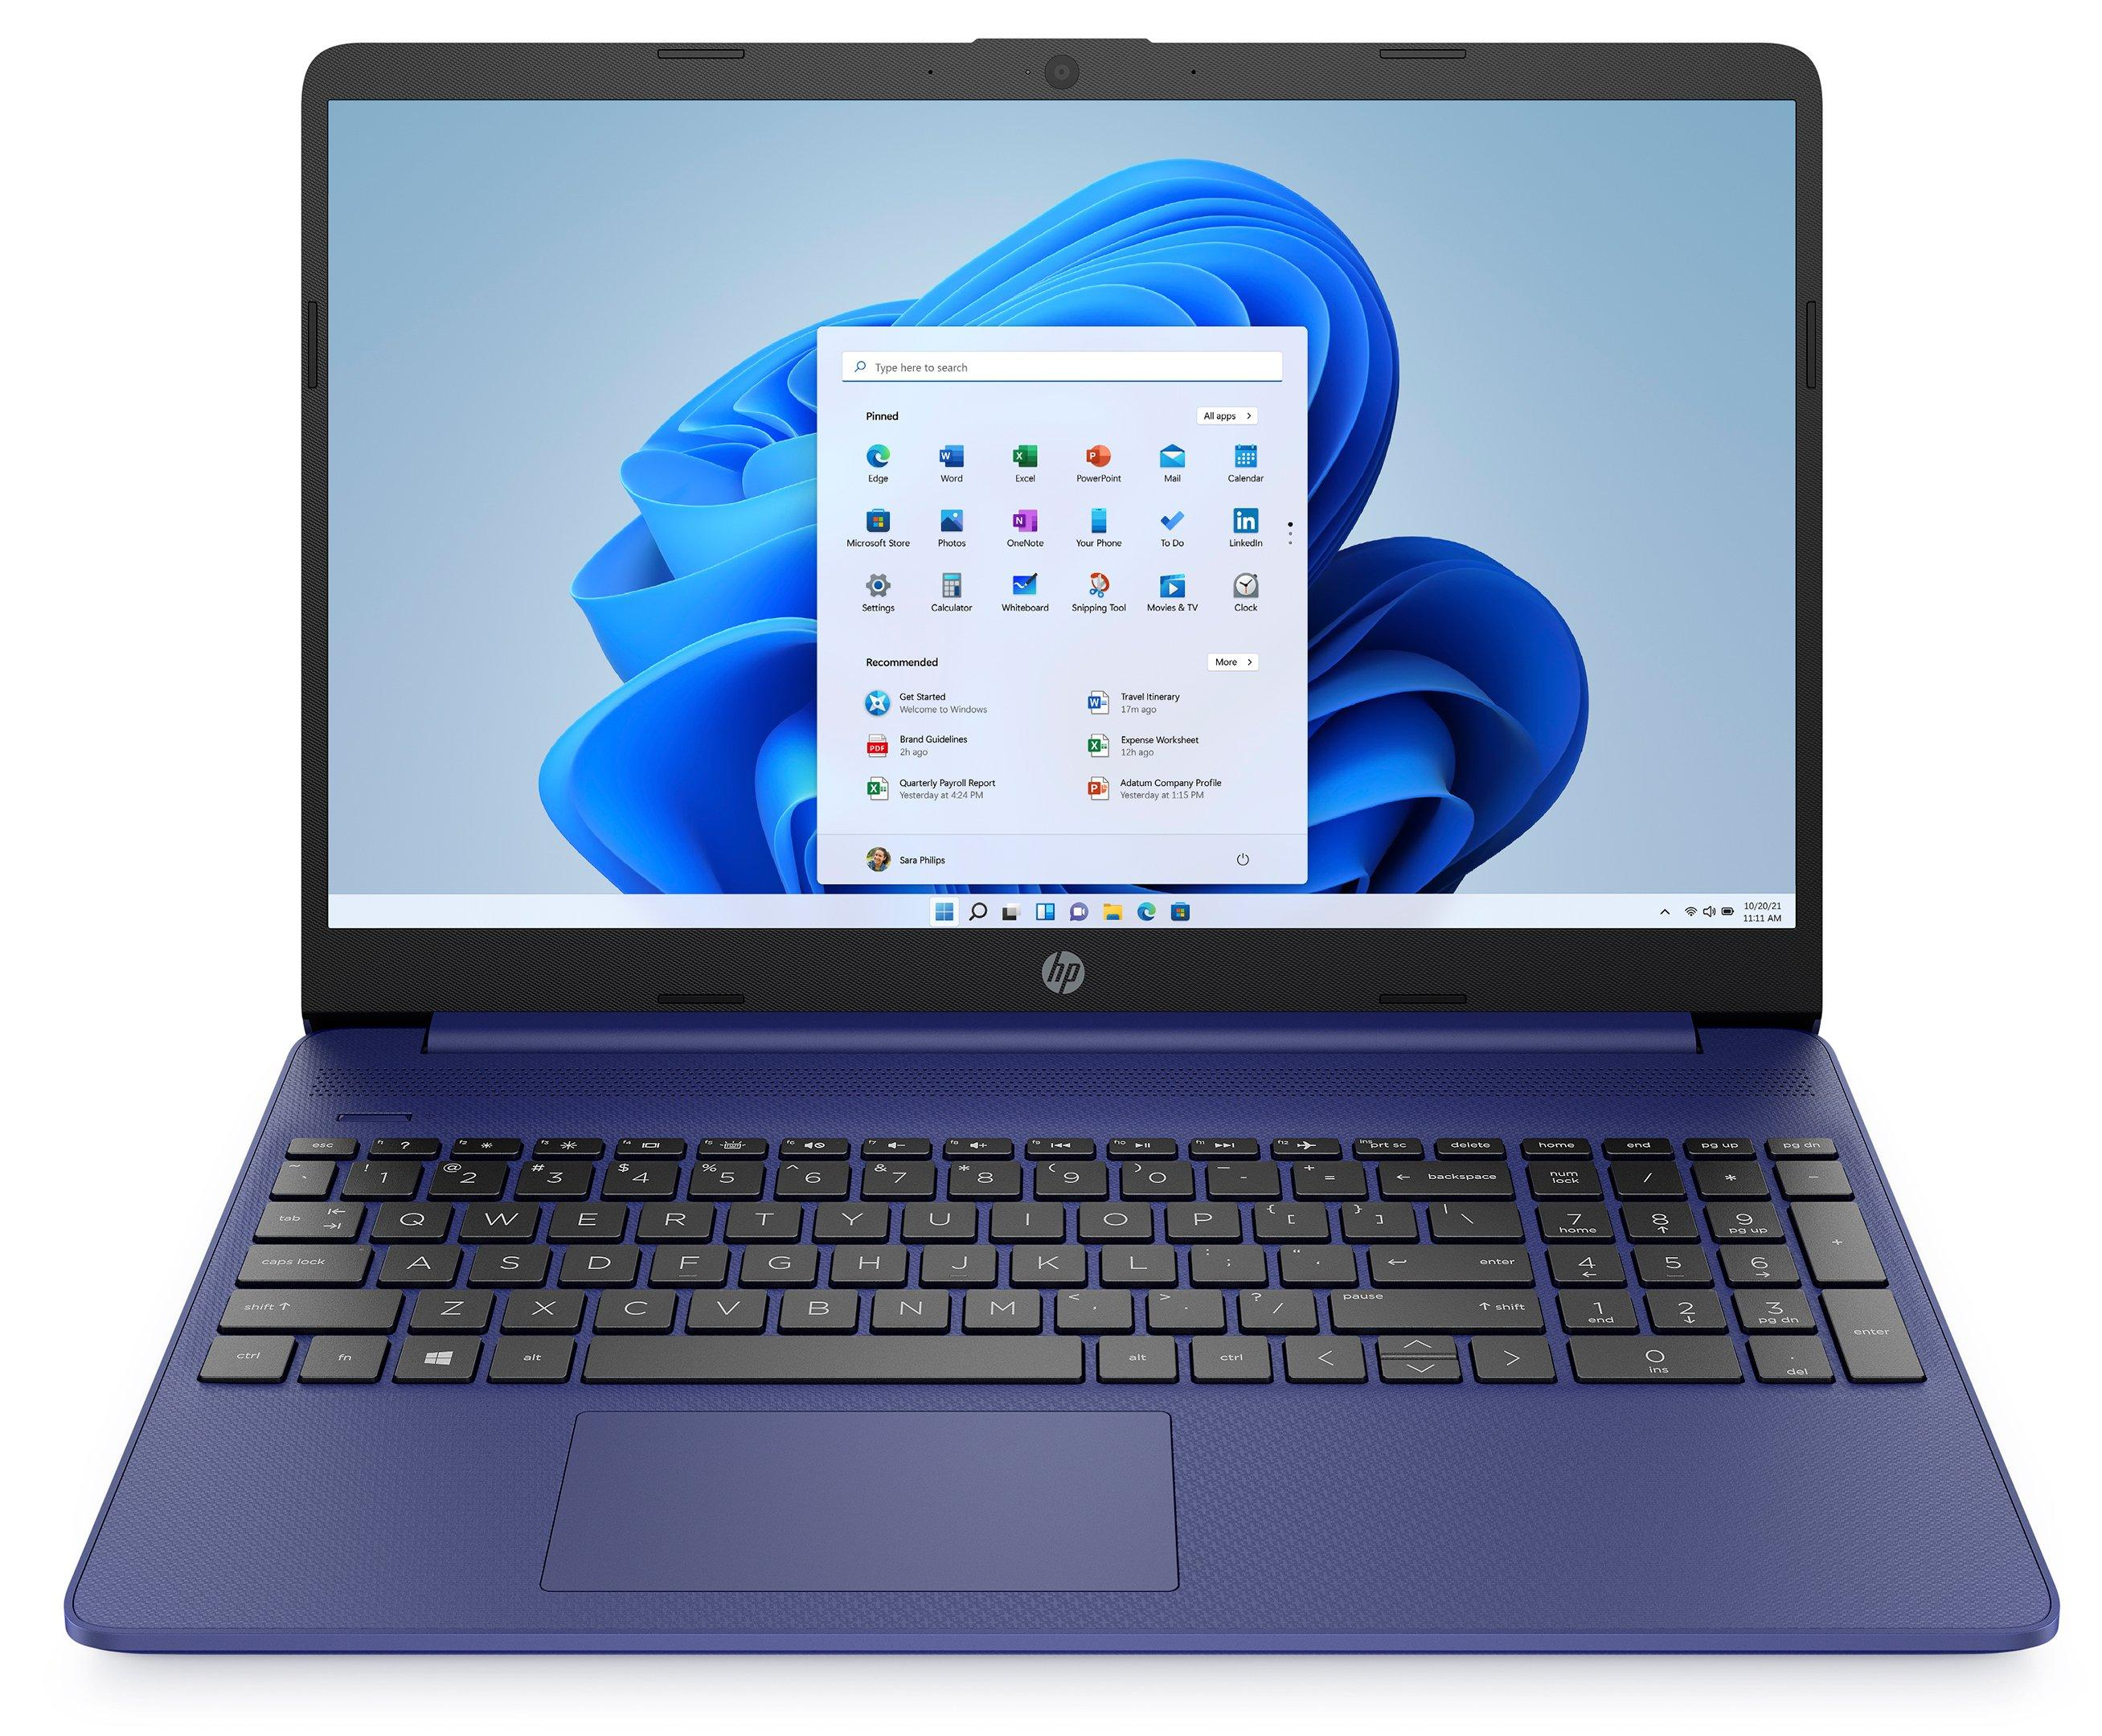 HP Laptop 15s, AMD Ryzen 5, 15.6 inch, 8GB, 256GB, Indigo Blue - eXtra Saudi